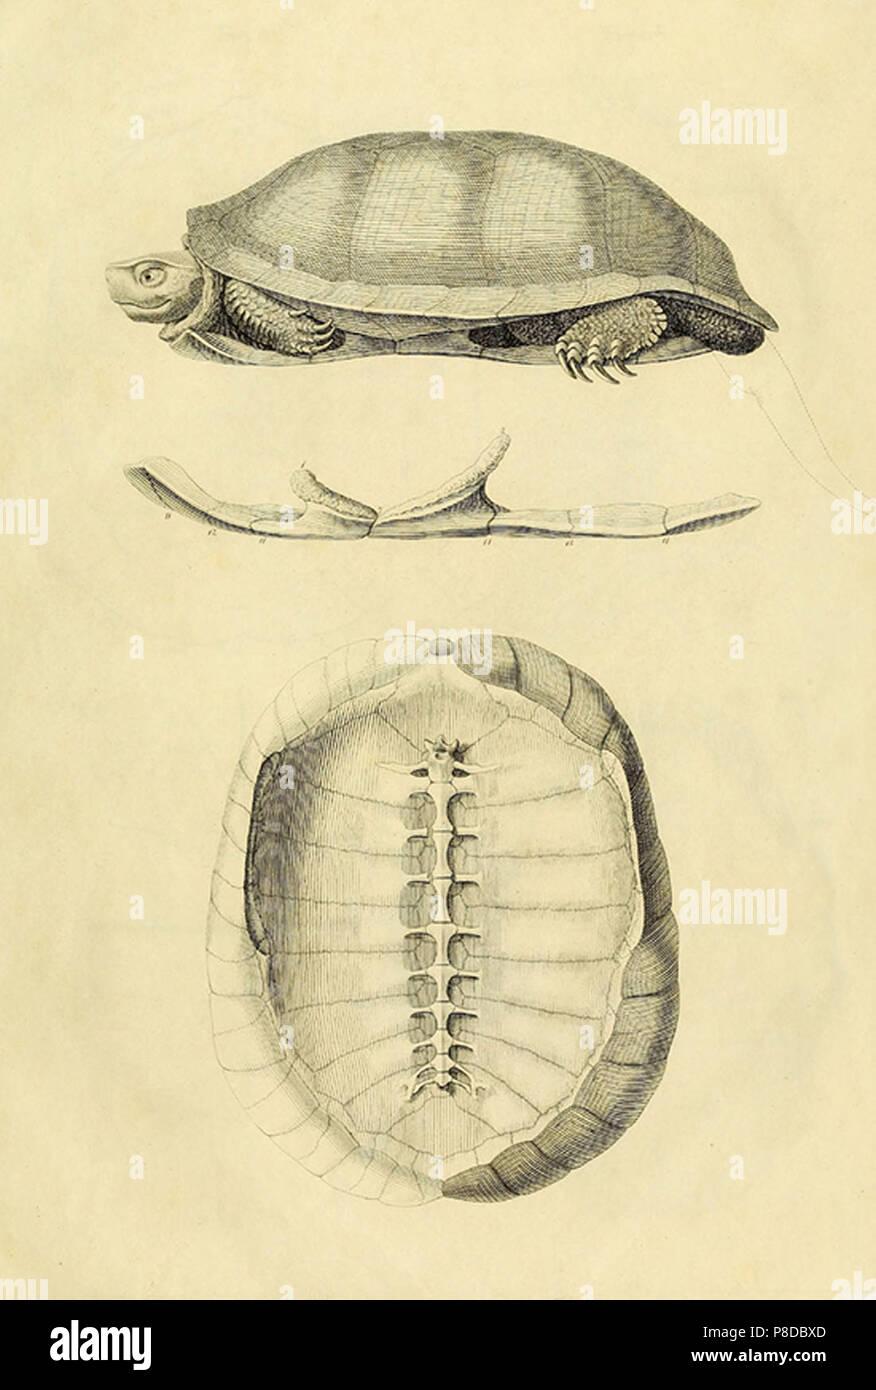 Turtle Anatomie Stockfoto, Bild: 211736405 - Alamy